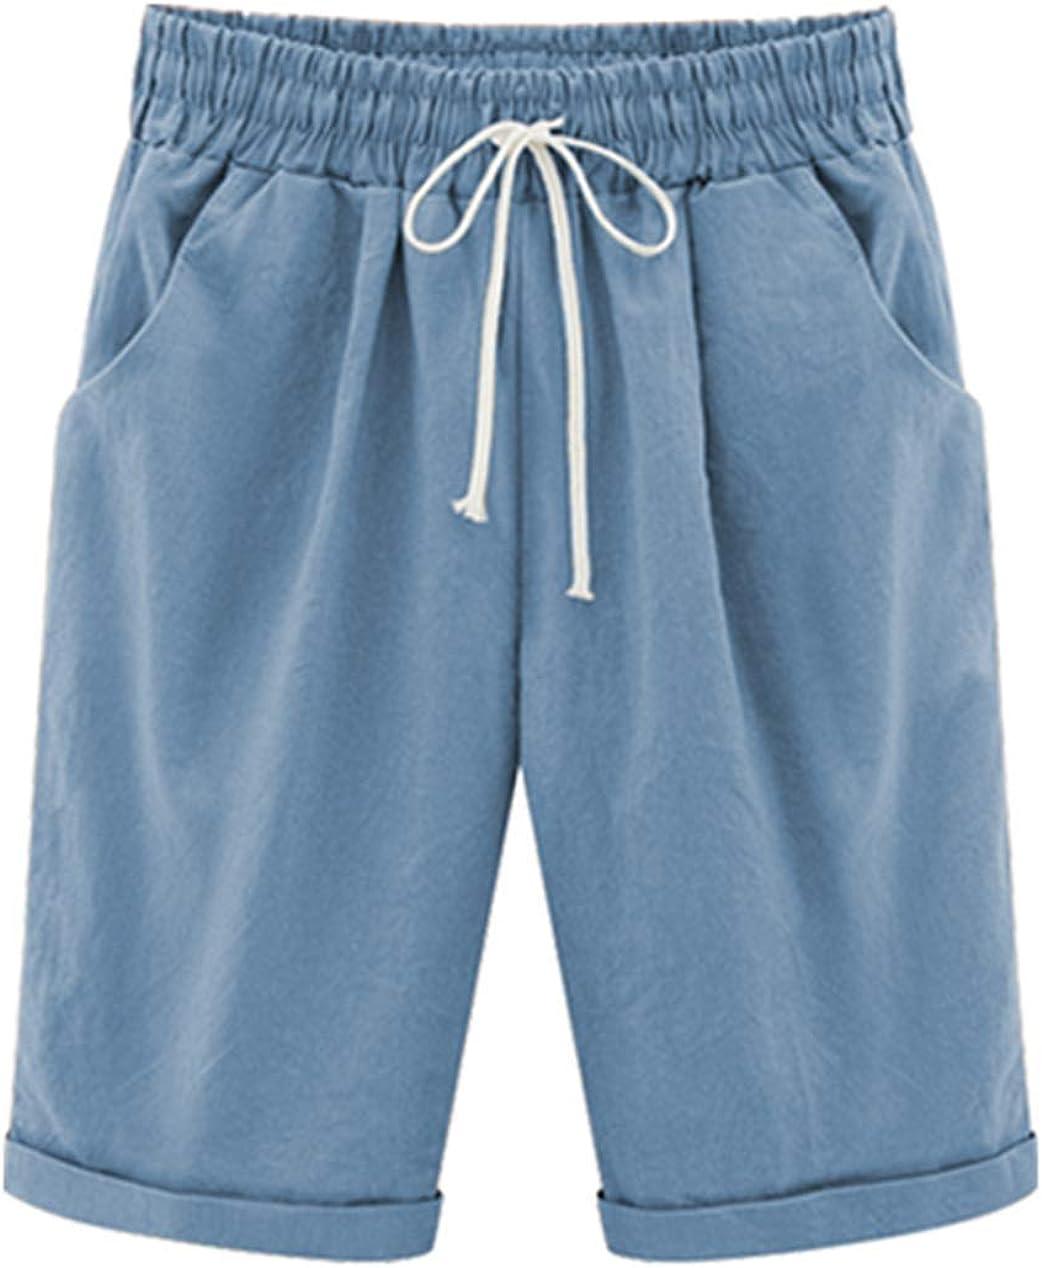 Vcansion Women's Drawstring Elastic Waist Shorts Plus Size Shorts Light Blue Asian 2XL/US 8-10